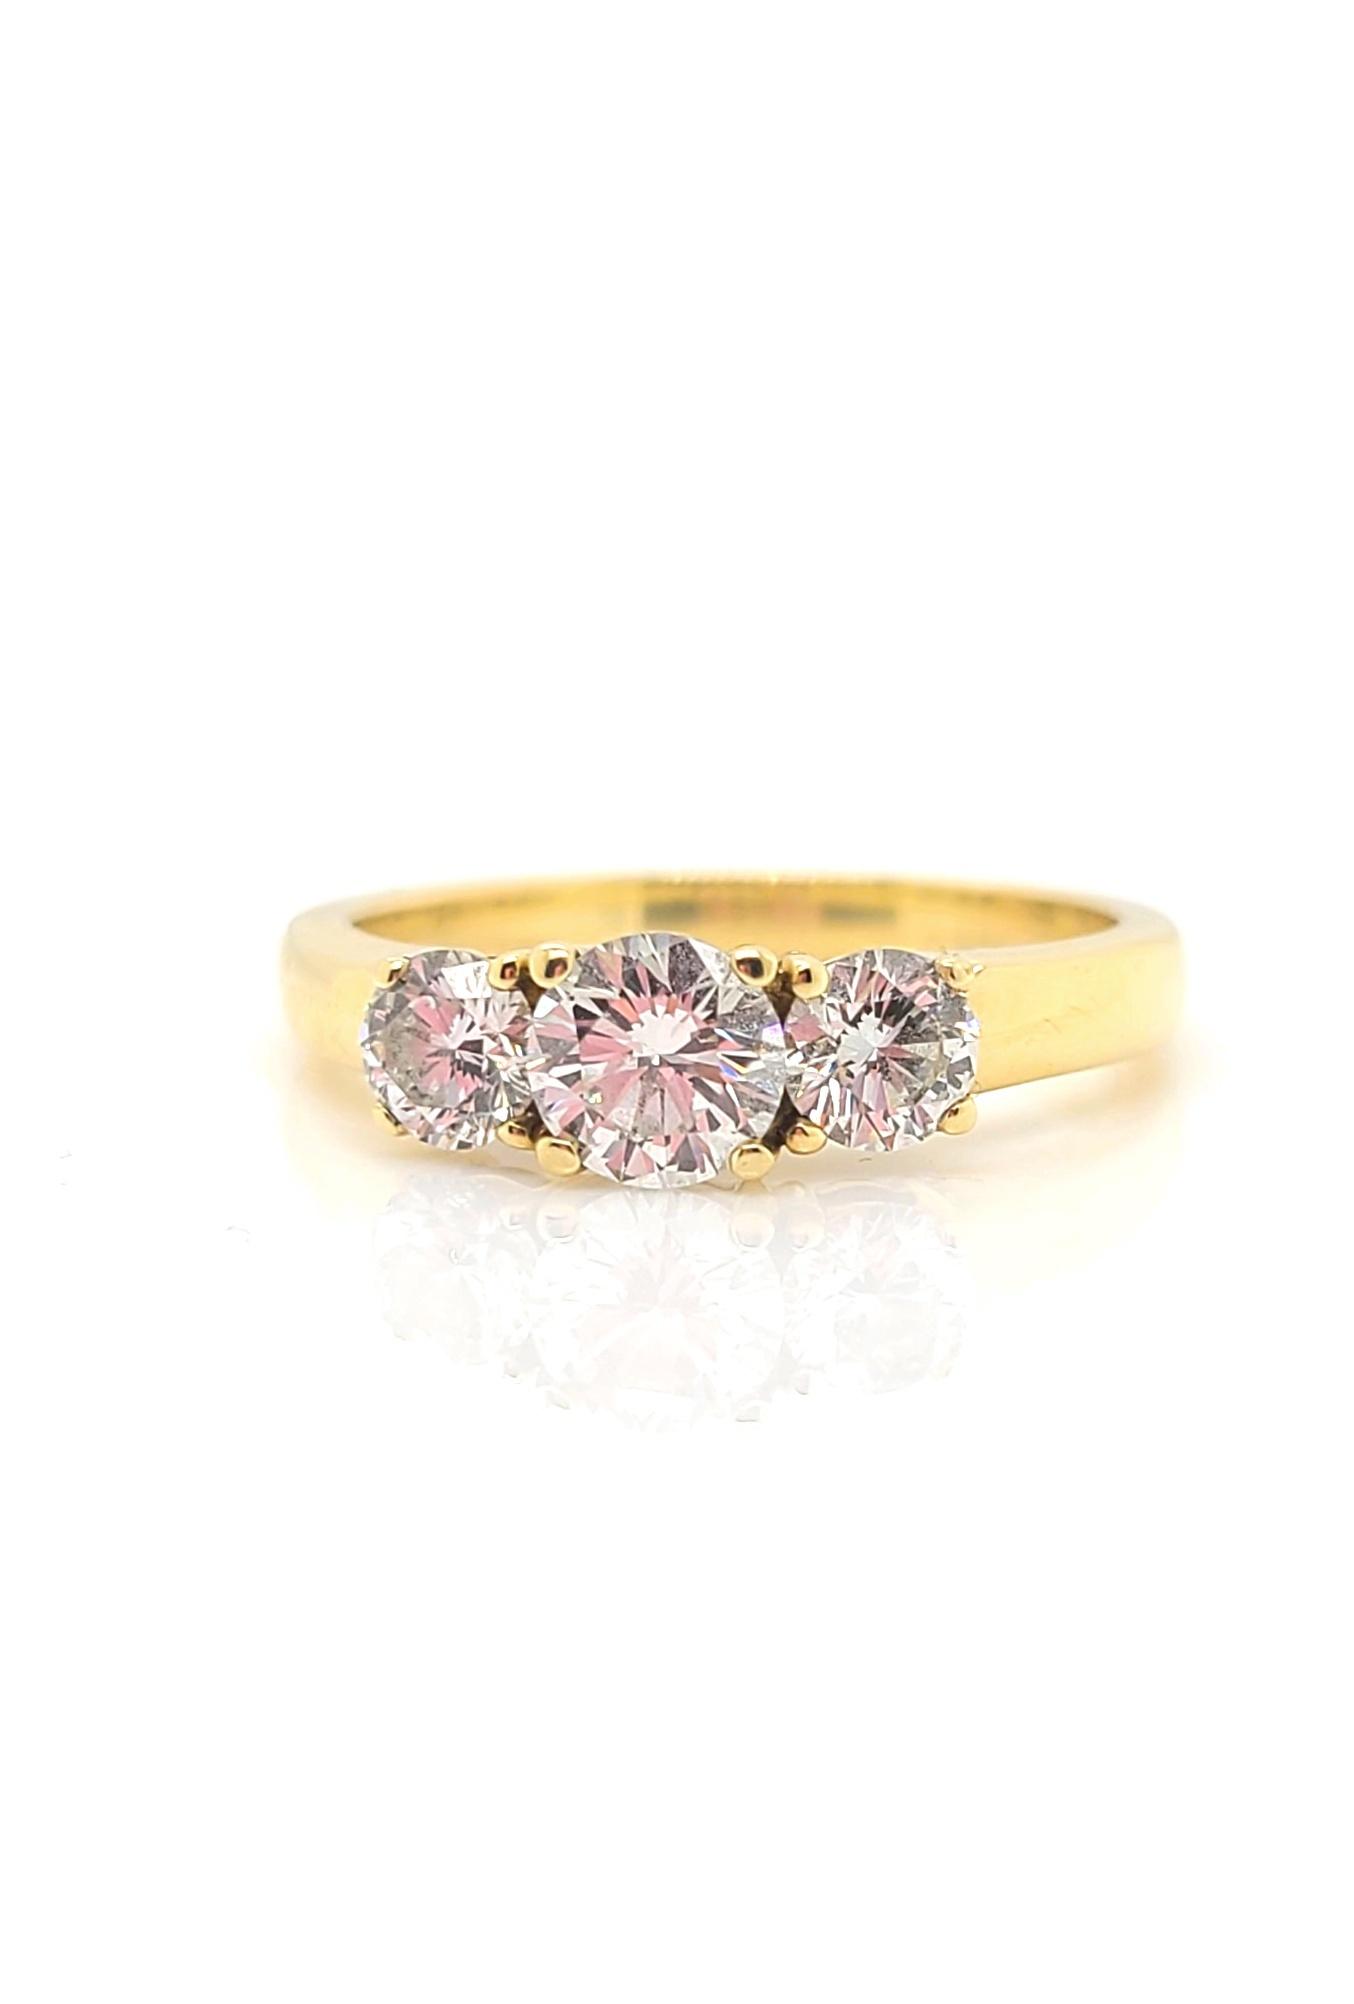 14kt Yellow Stone 3-Stone Diamond Ring, 1.0ctw G/VS